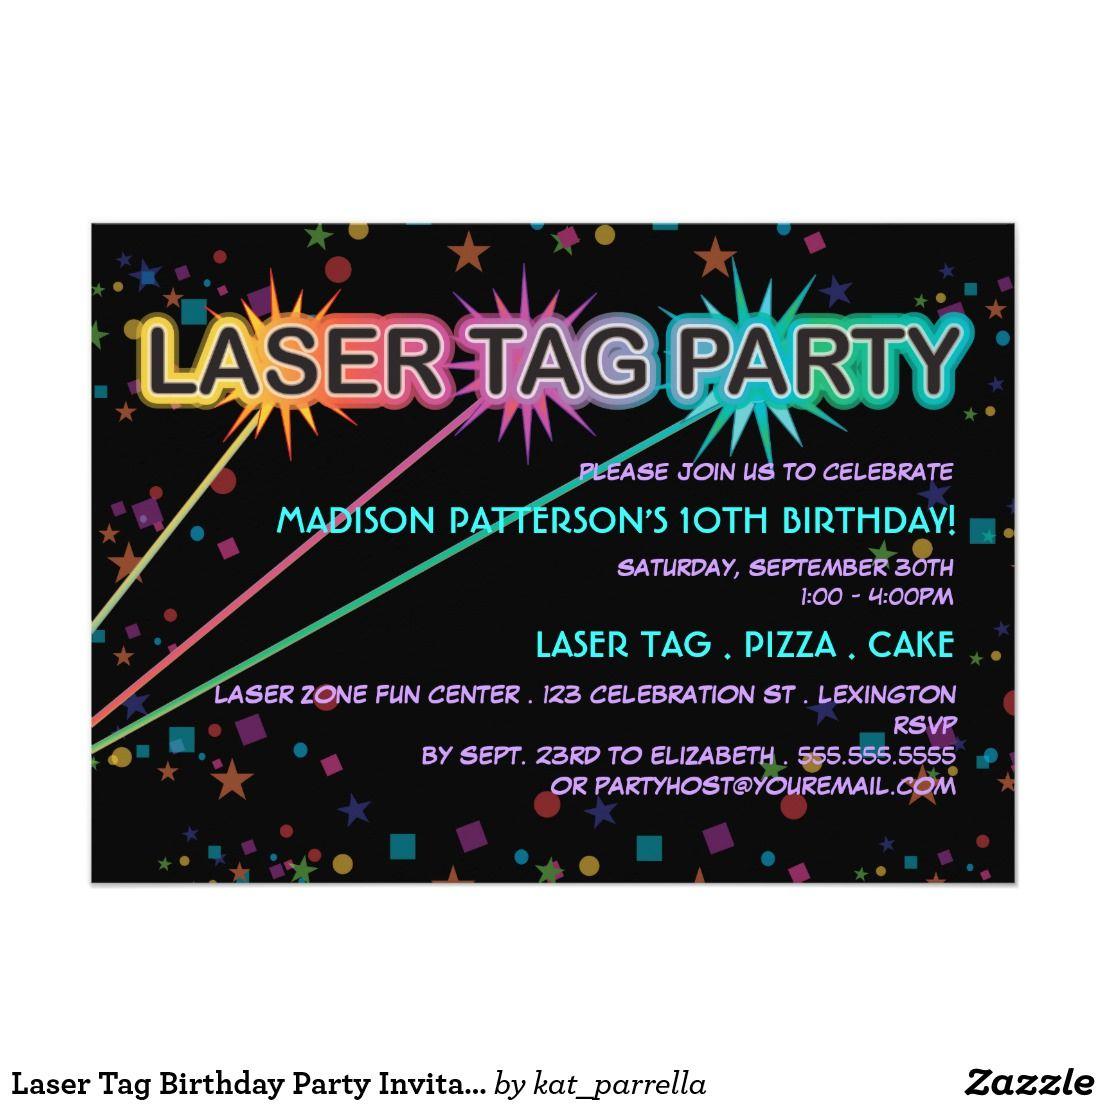 Laser tag birthday party invitation kids birthdays pinterest laser tag birthday party invitation monicamarmolfo Choice Image